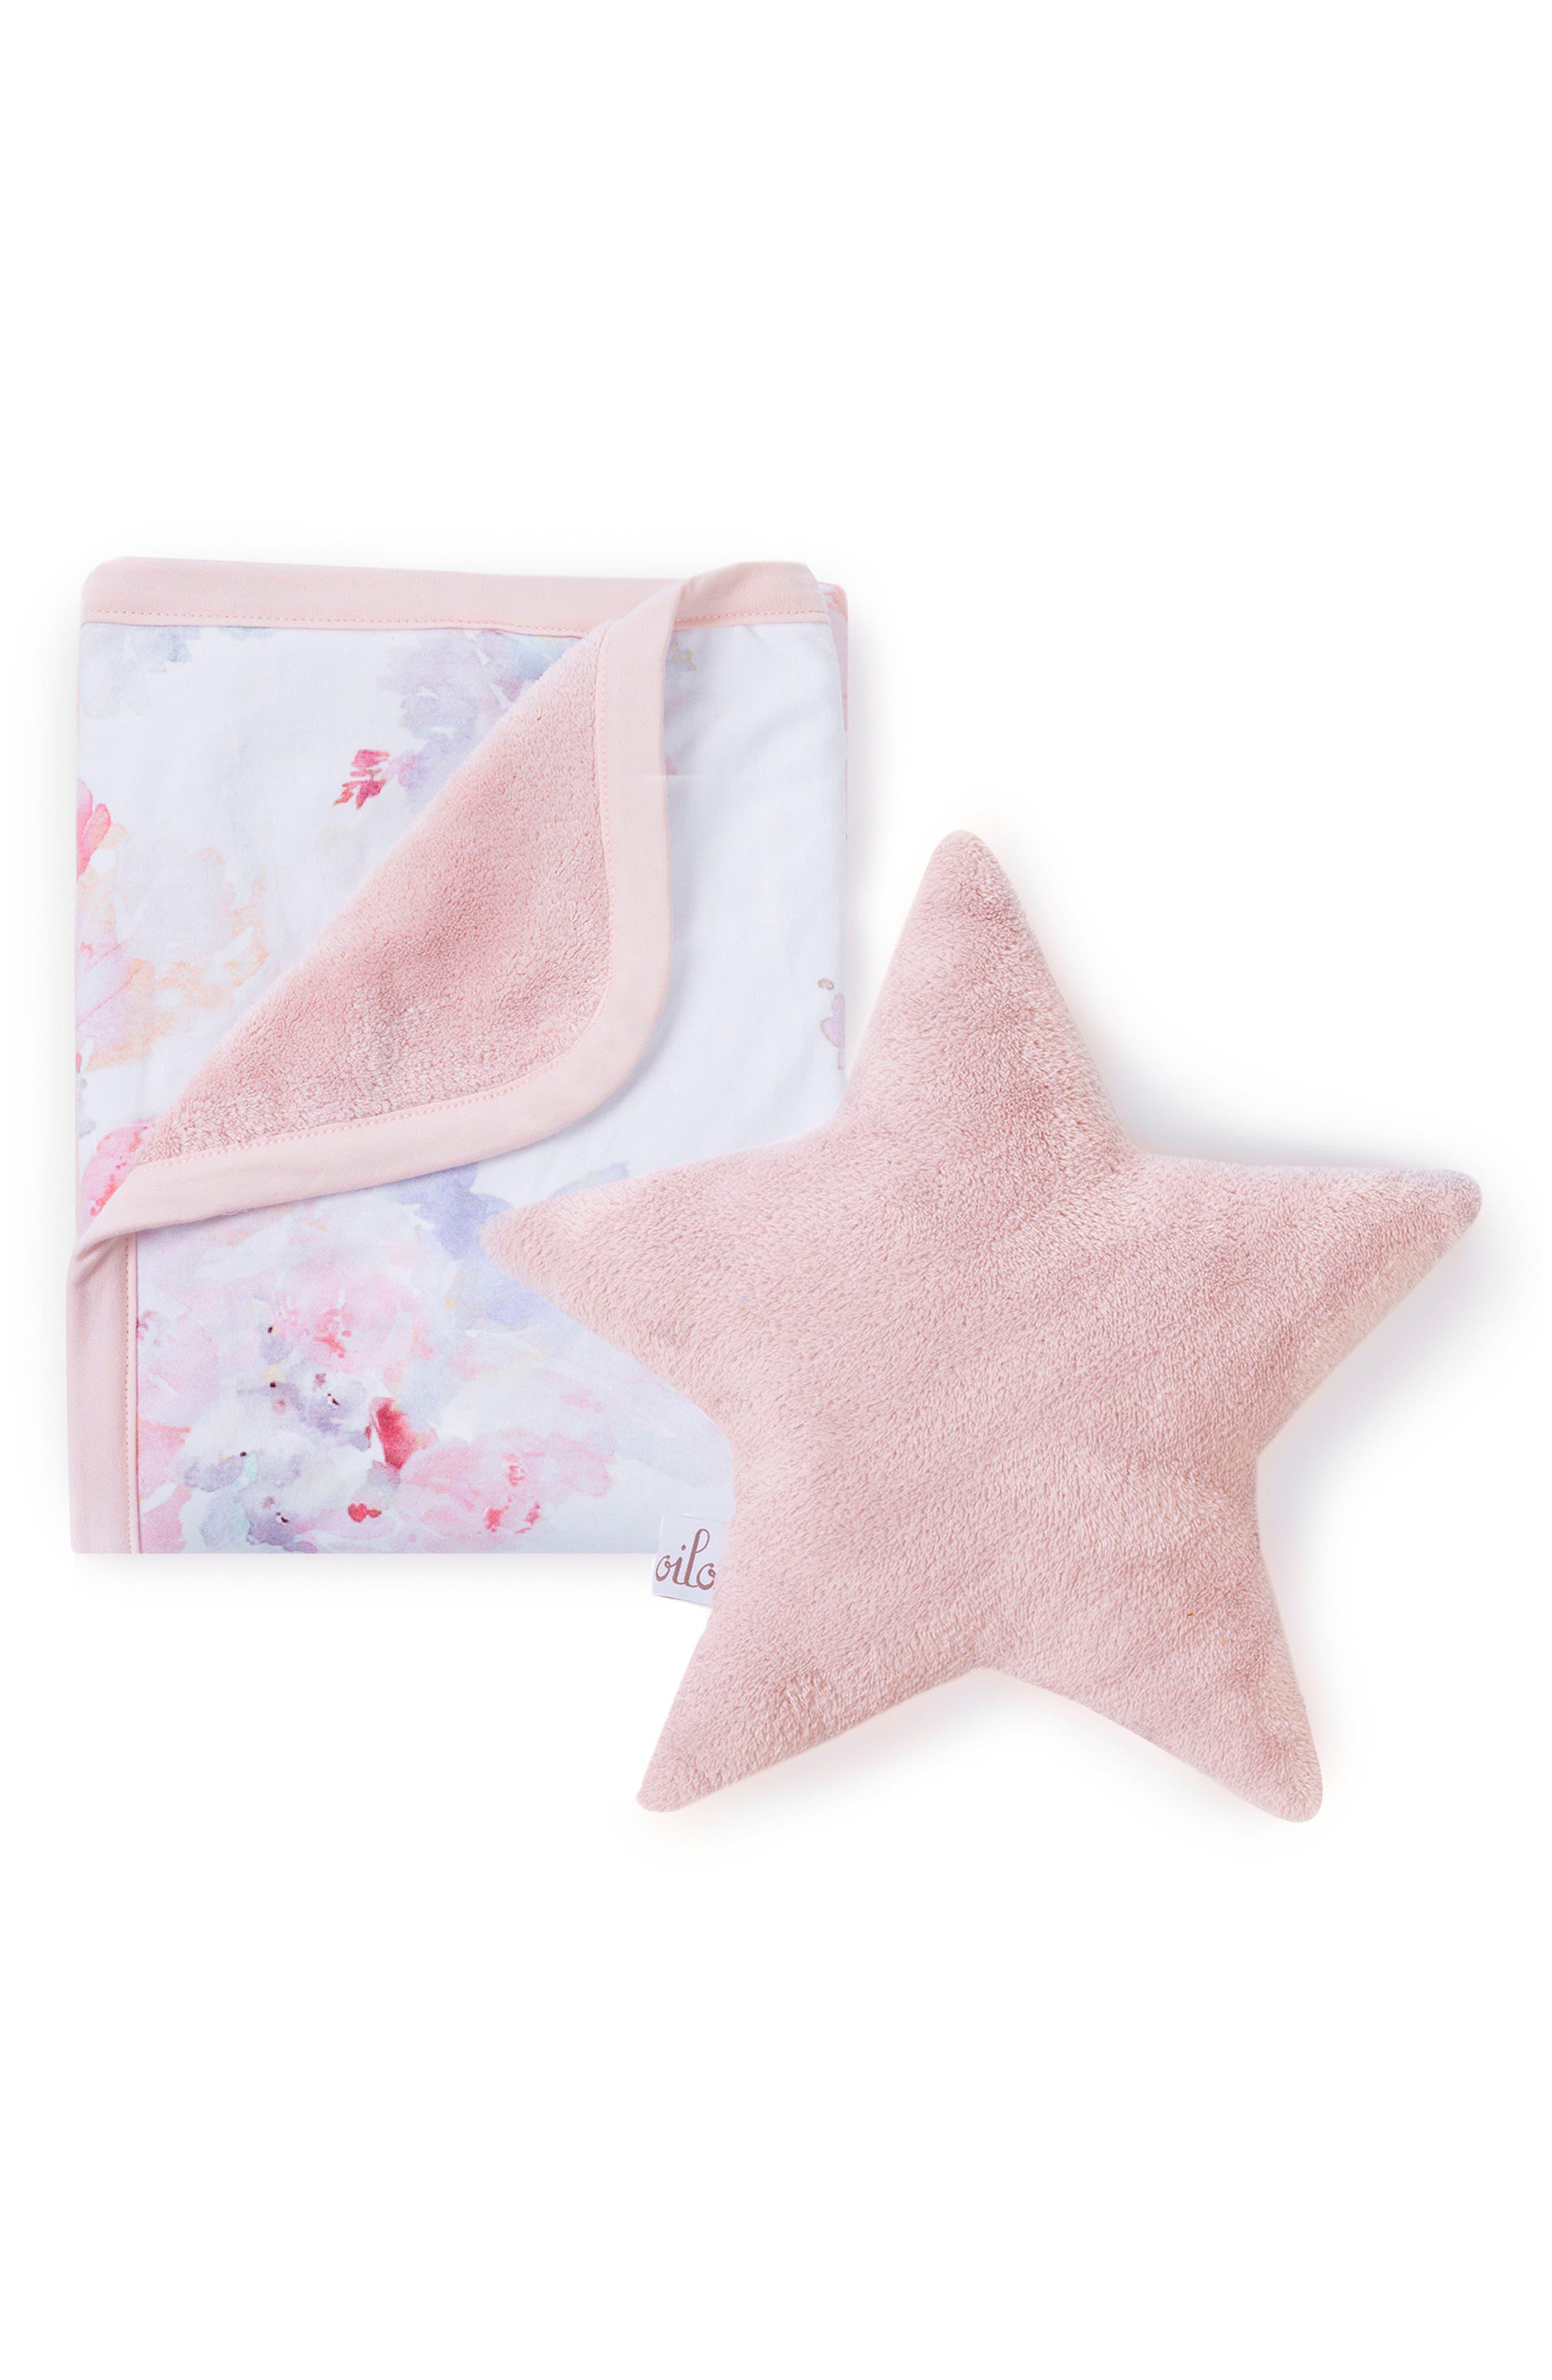 Prim Cuddle Blanket & Star Pillow Set,                         Main,                         color, Prim